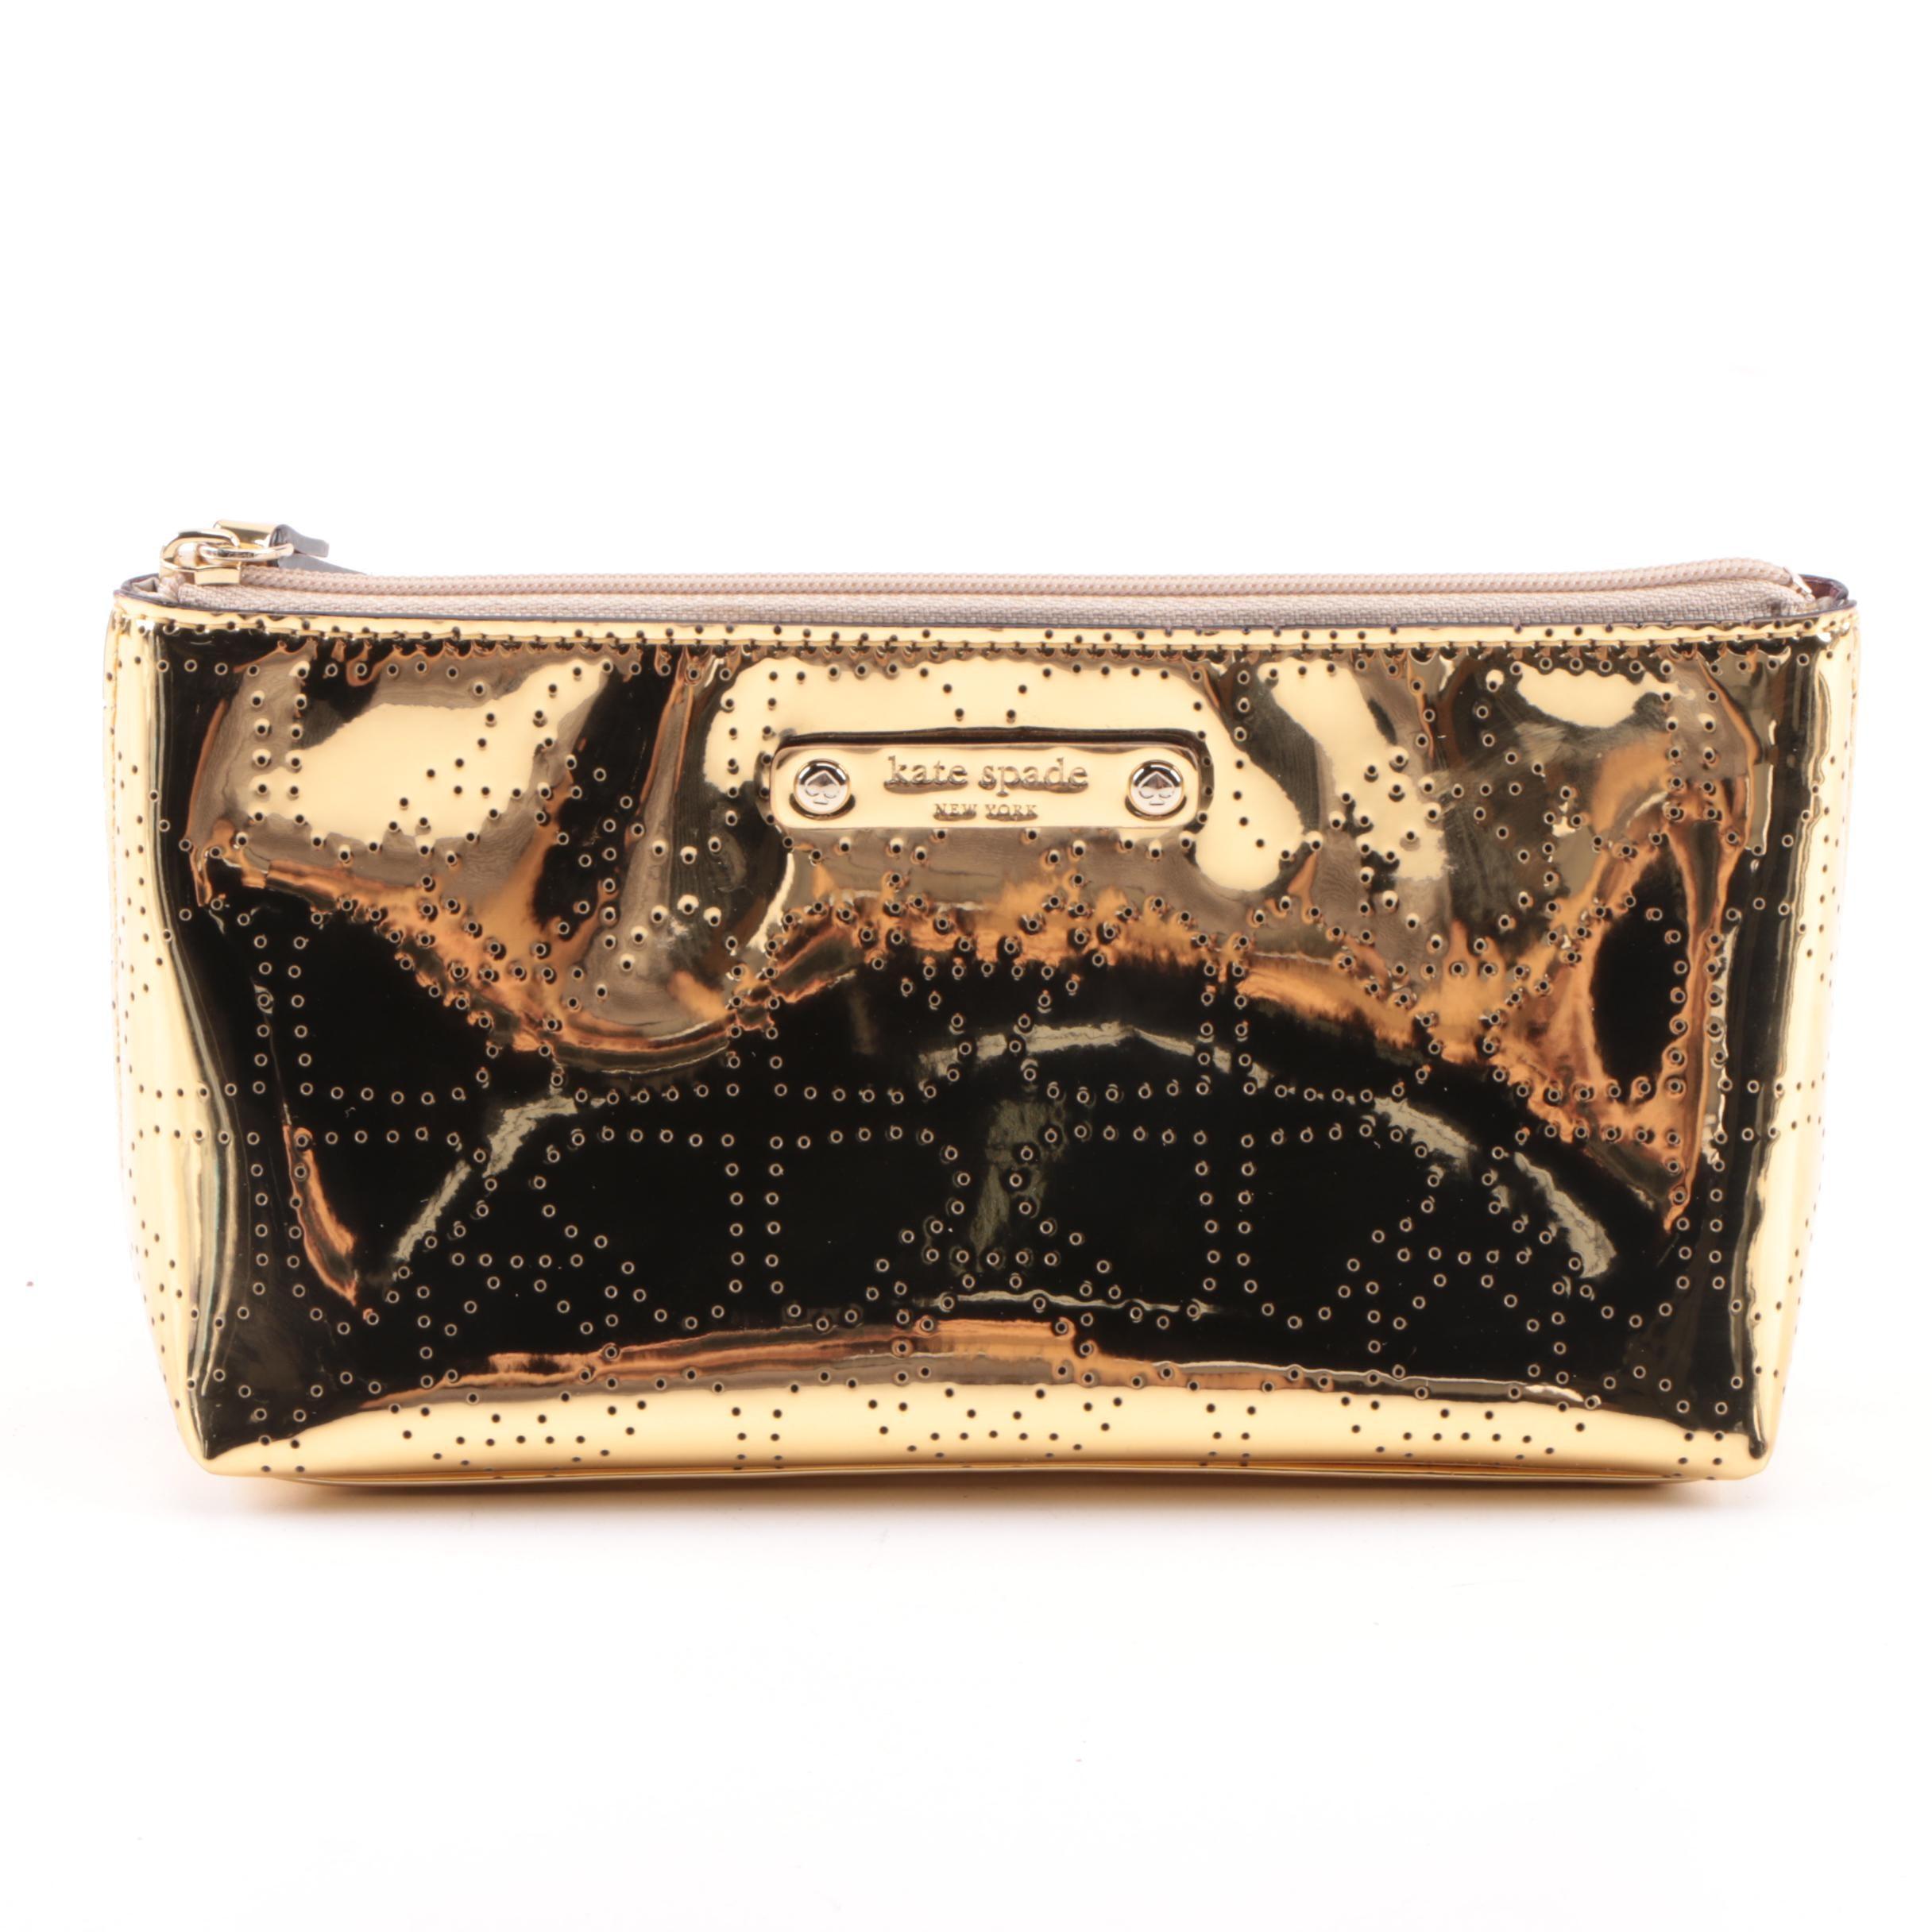 Kate Spade New York Metallic Gold Pouch